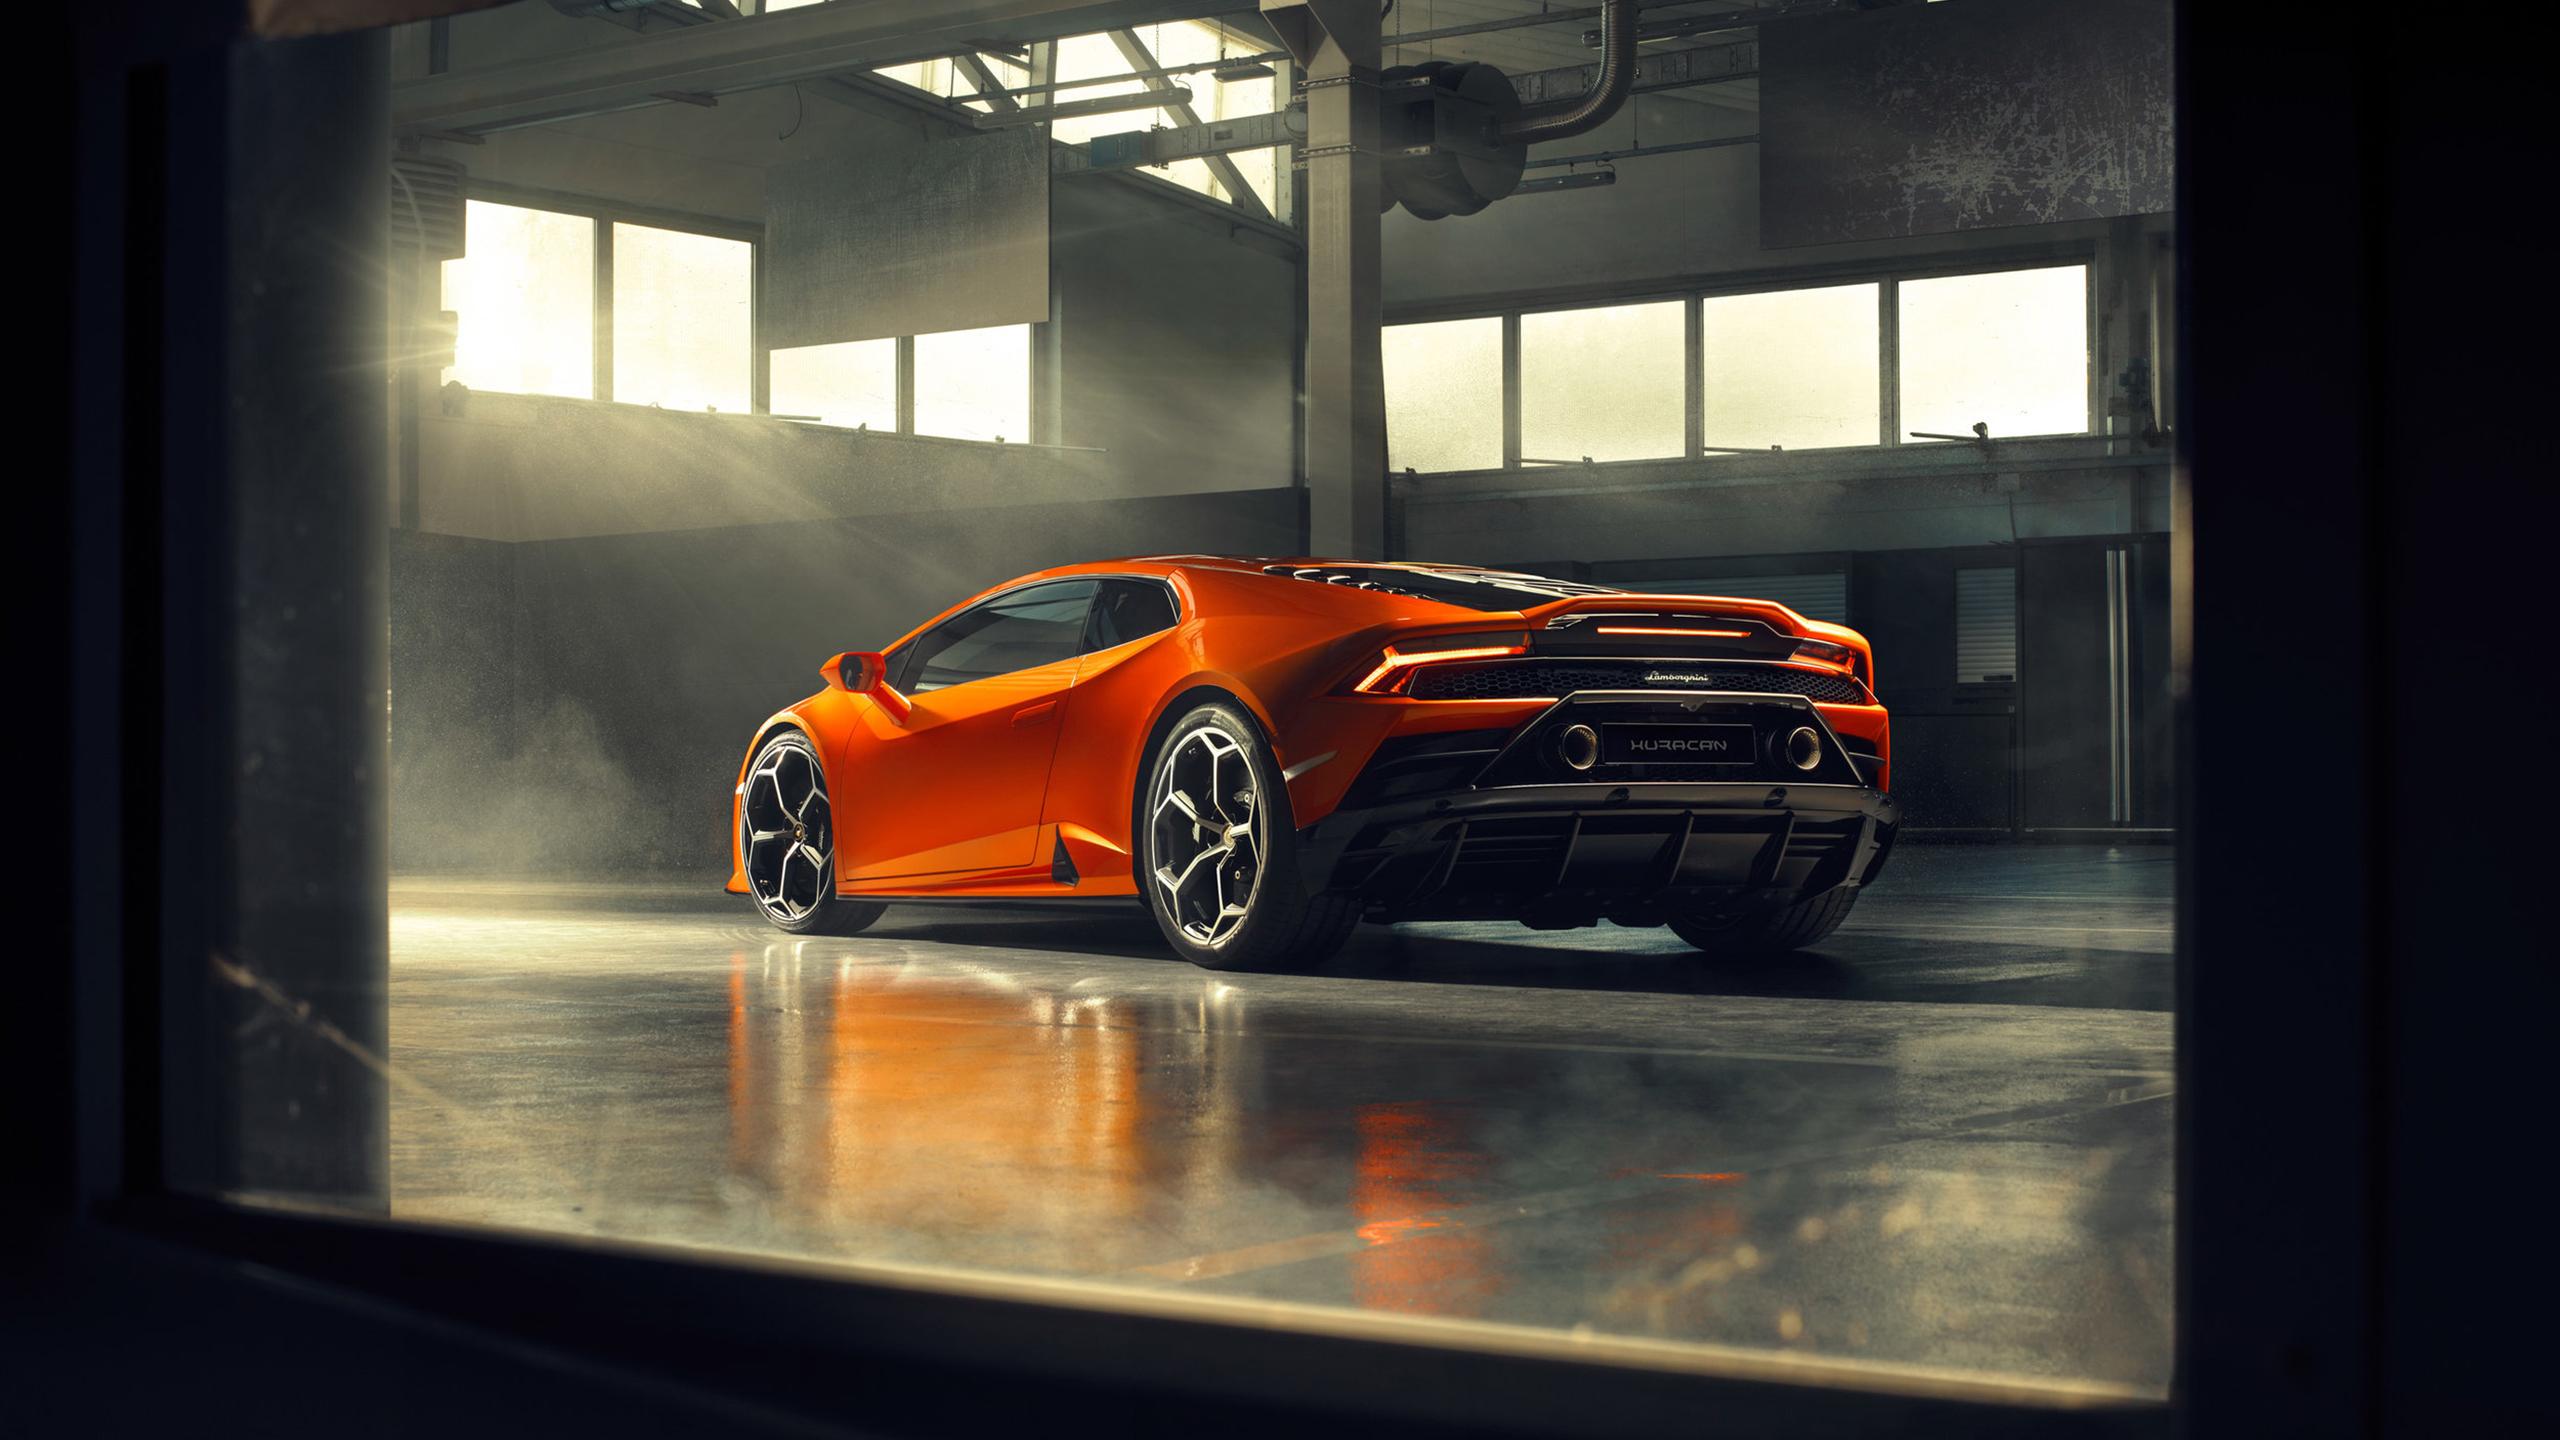 Lamborghini Huracan Evo 2019 4k 2 Wallpaper Hd Car Wallpapers Id 11878